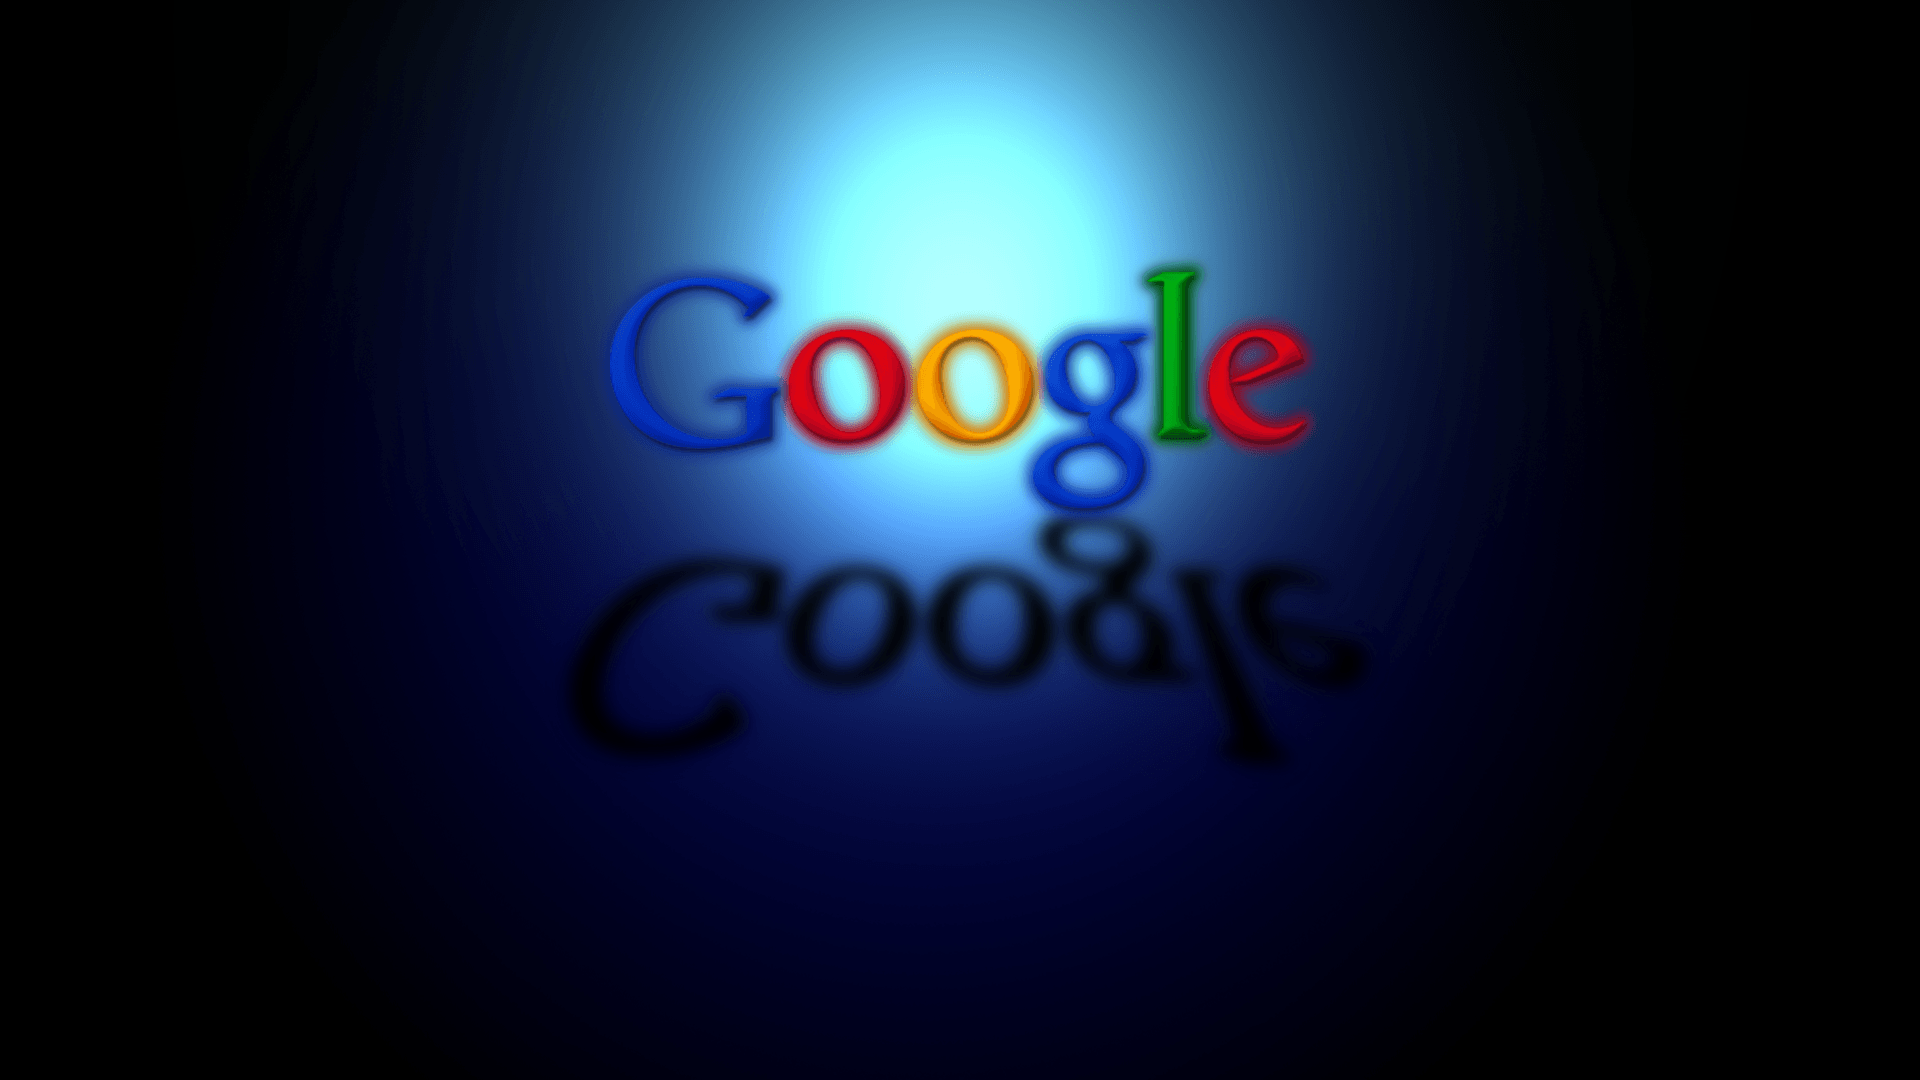 Google Free Computer Wallpaper